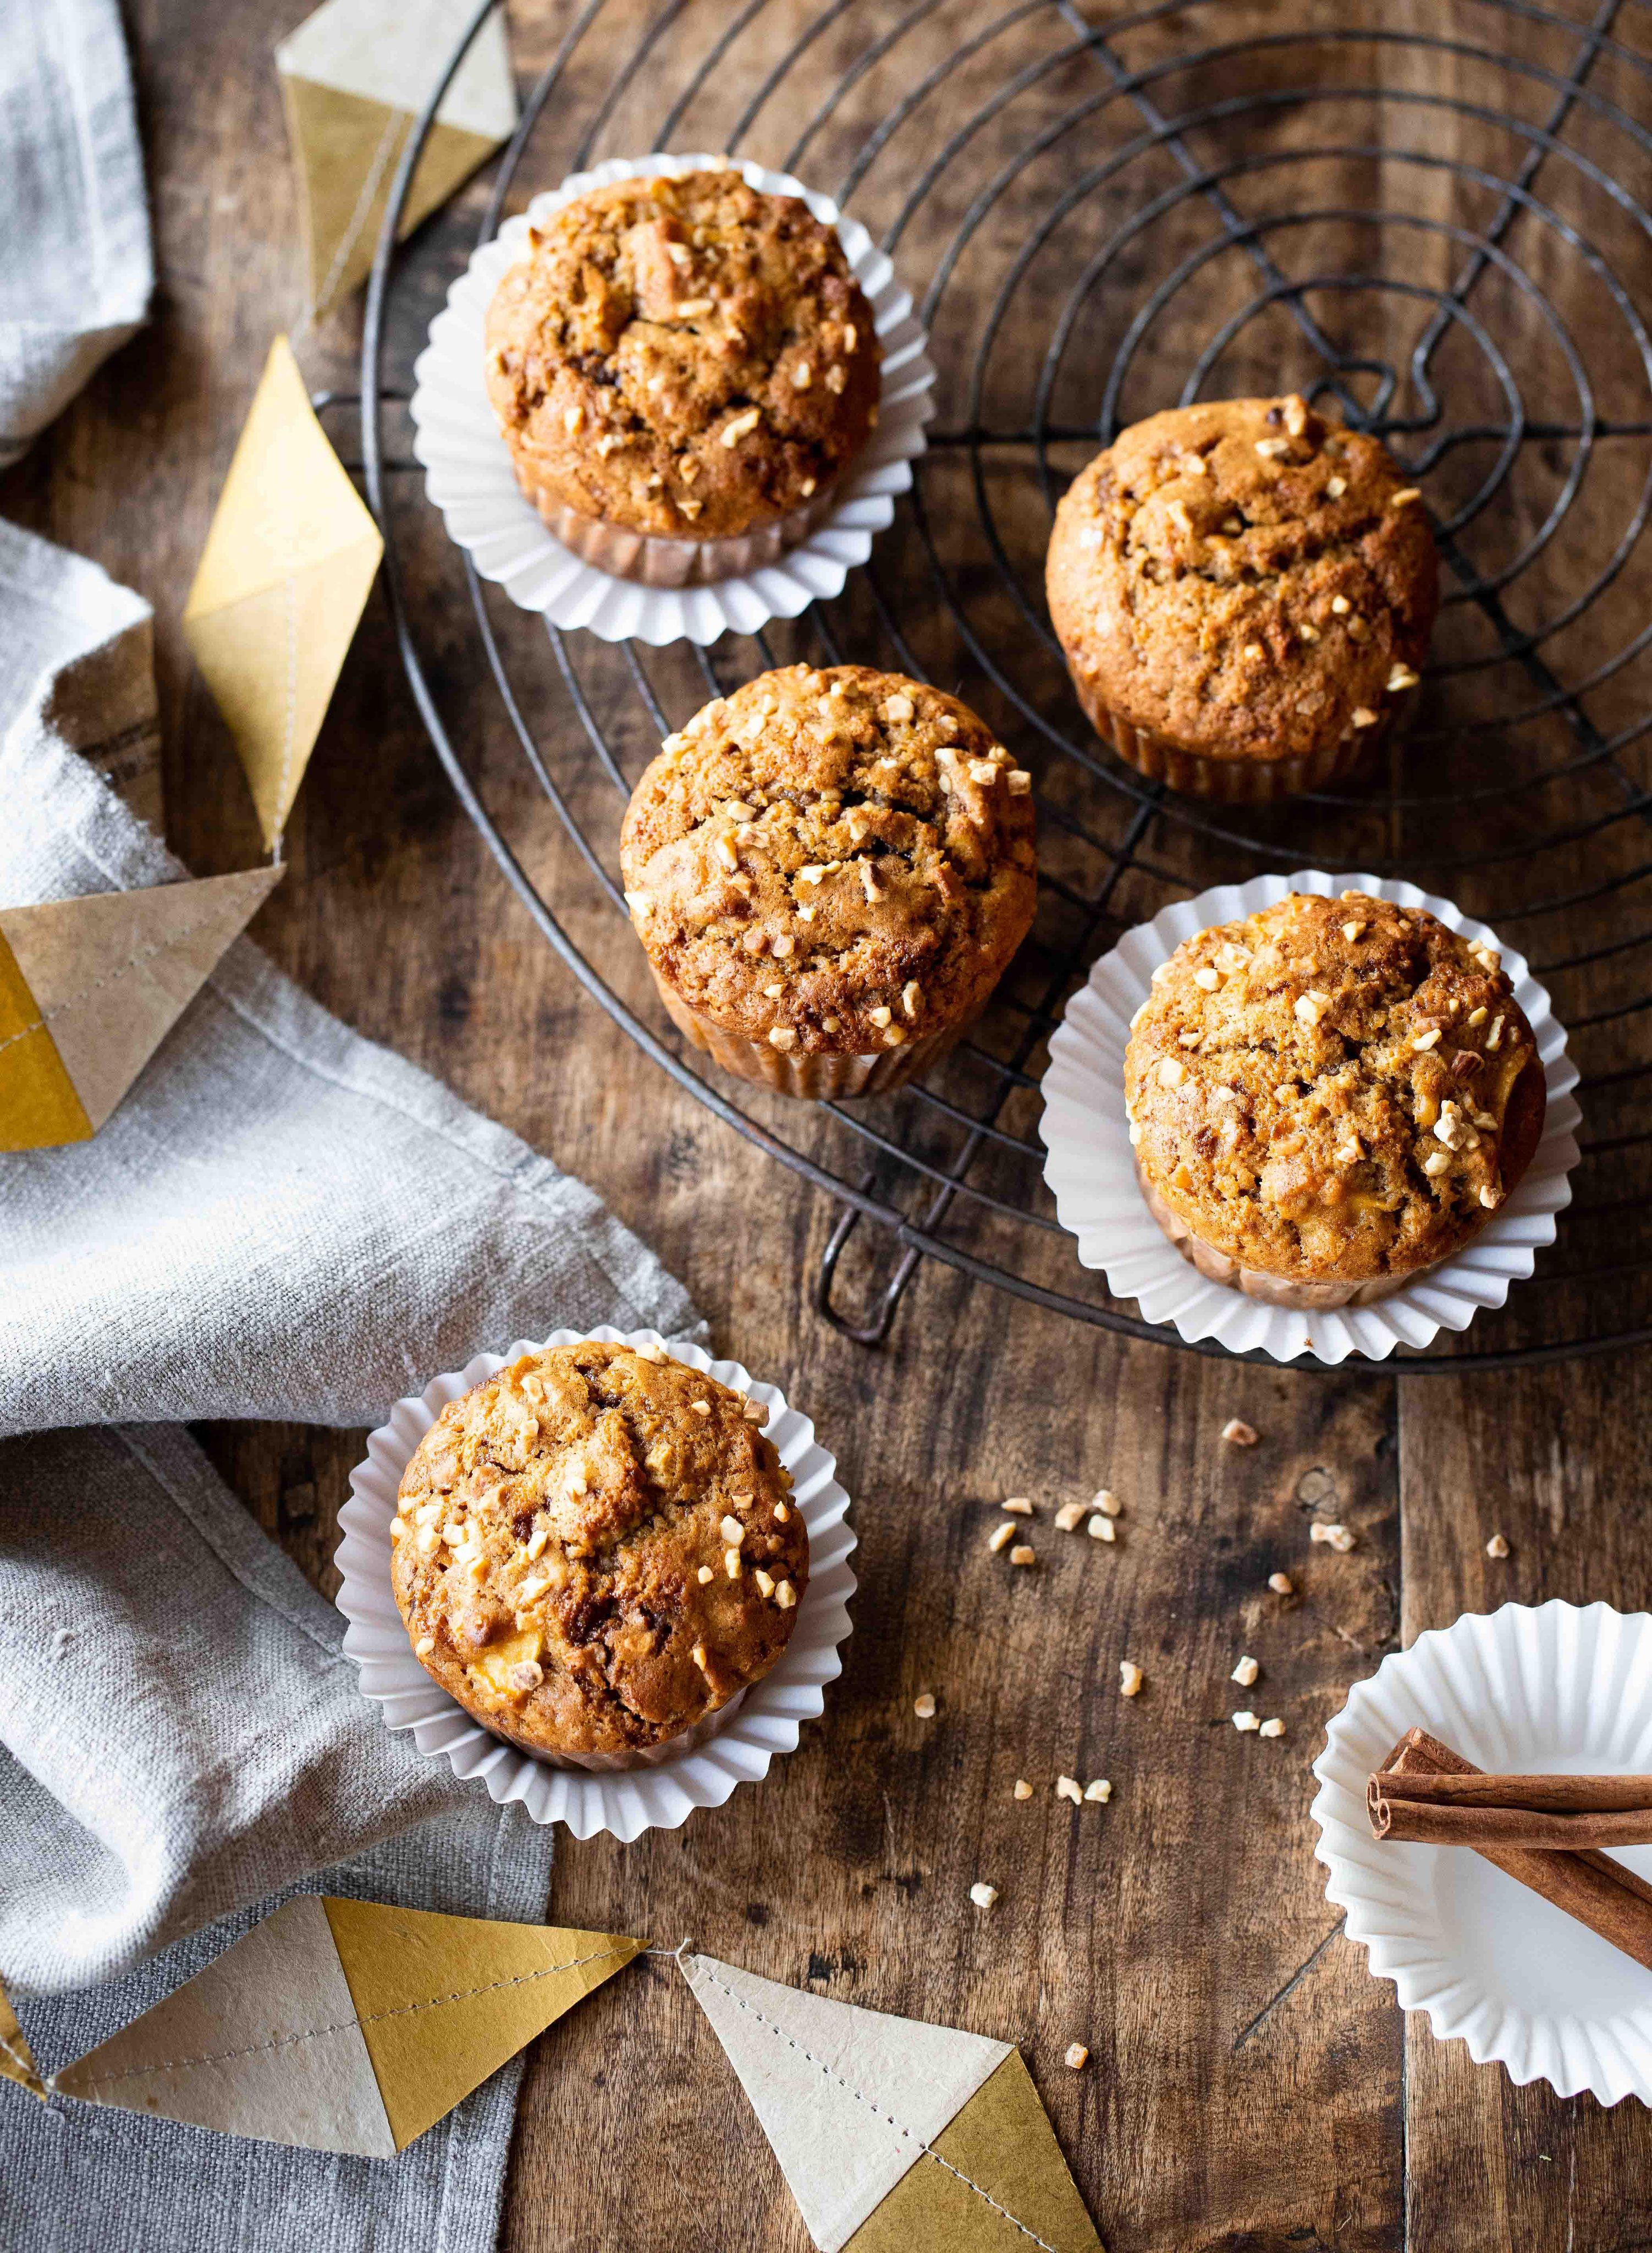 Muffins aux pommes, nougatine & cannelle #dessertfacileetrapide